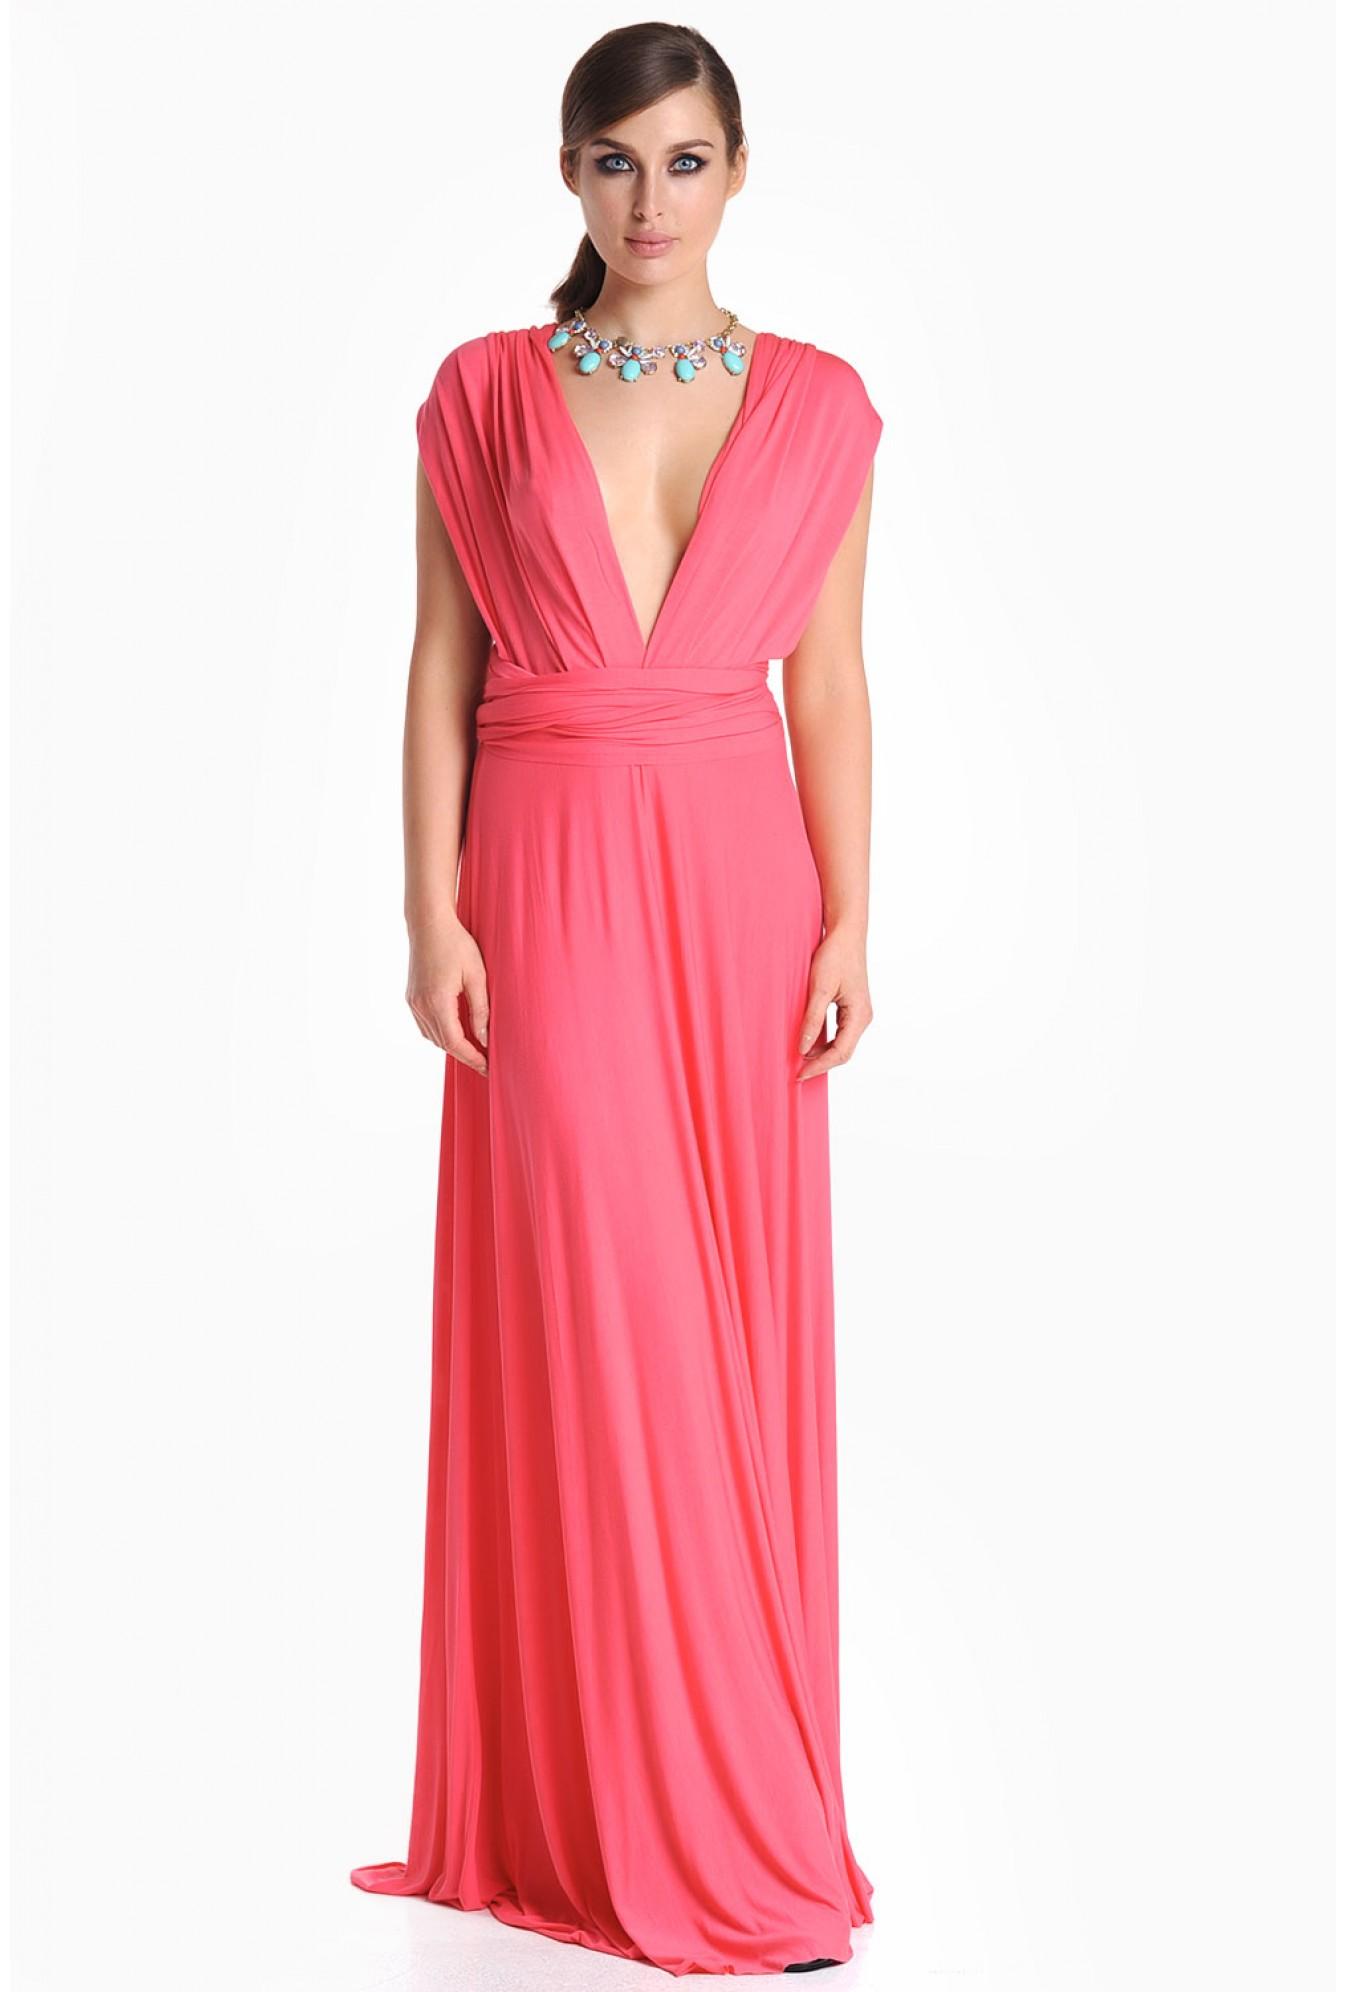 5ca099bd3c iCLOTHING Blair Multi Way Maxi Dress in Coral | iCLOTHING